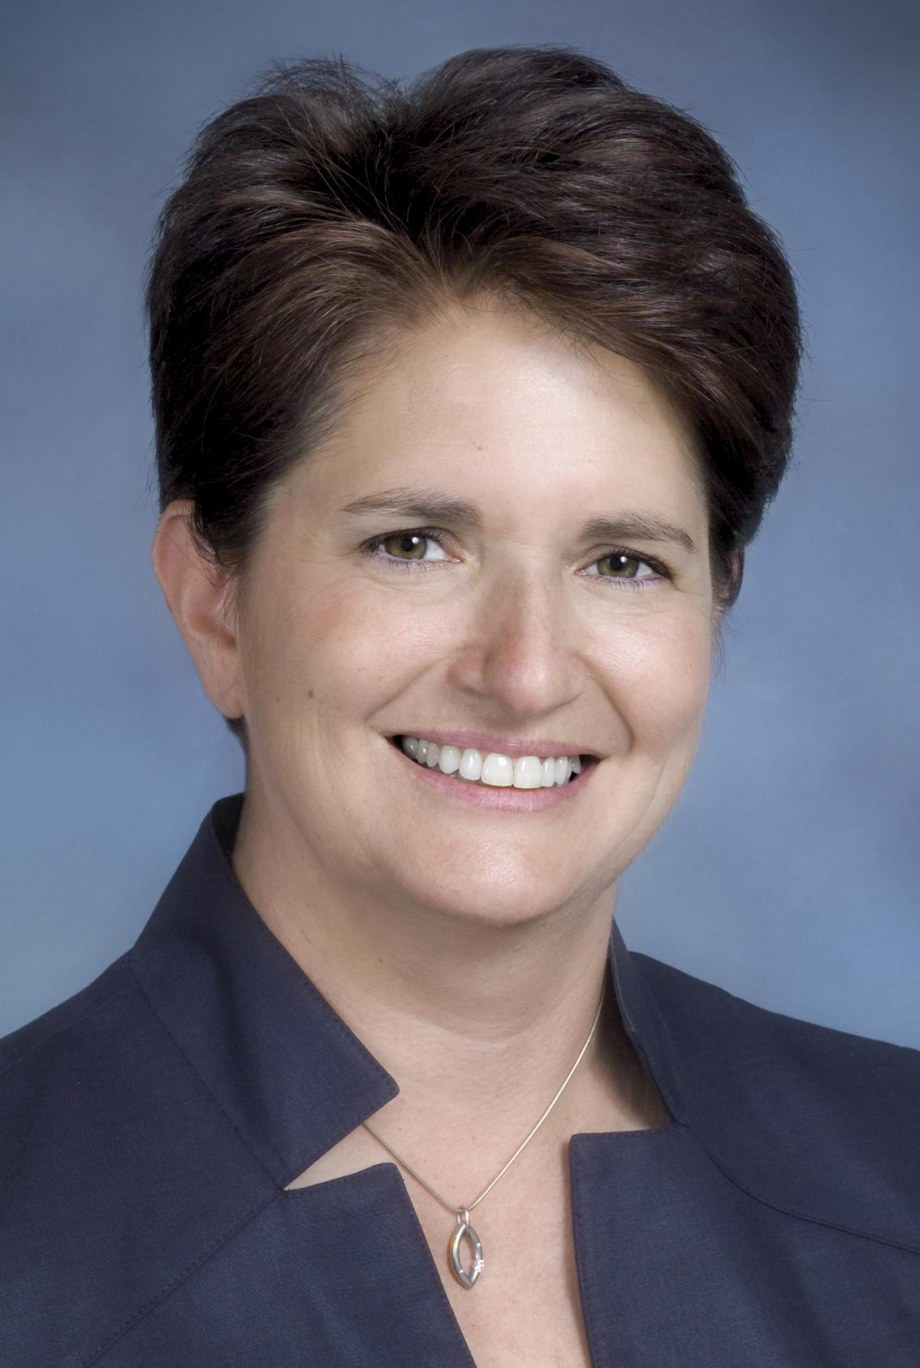 Lisa Lattanza